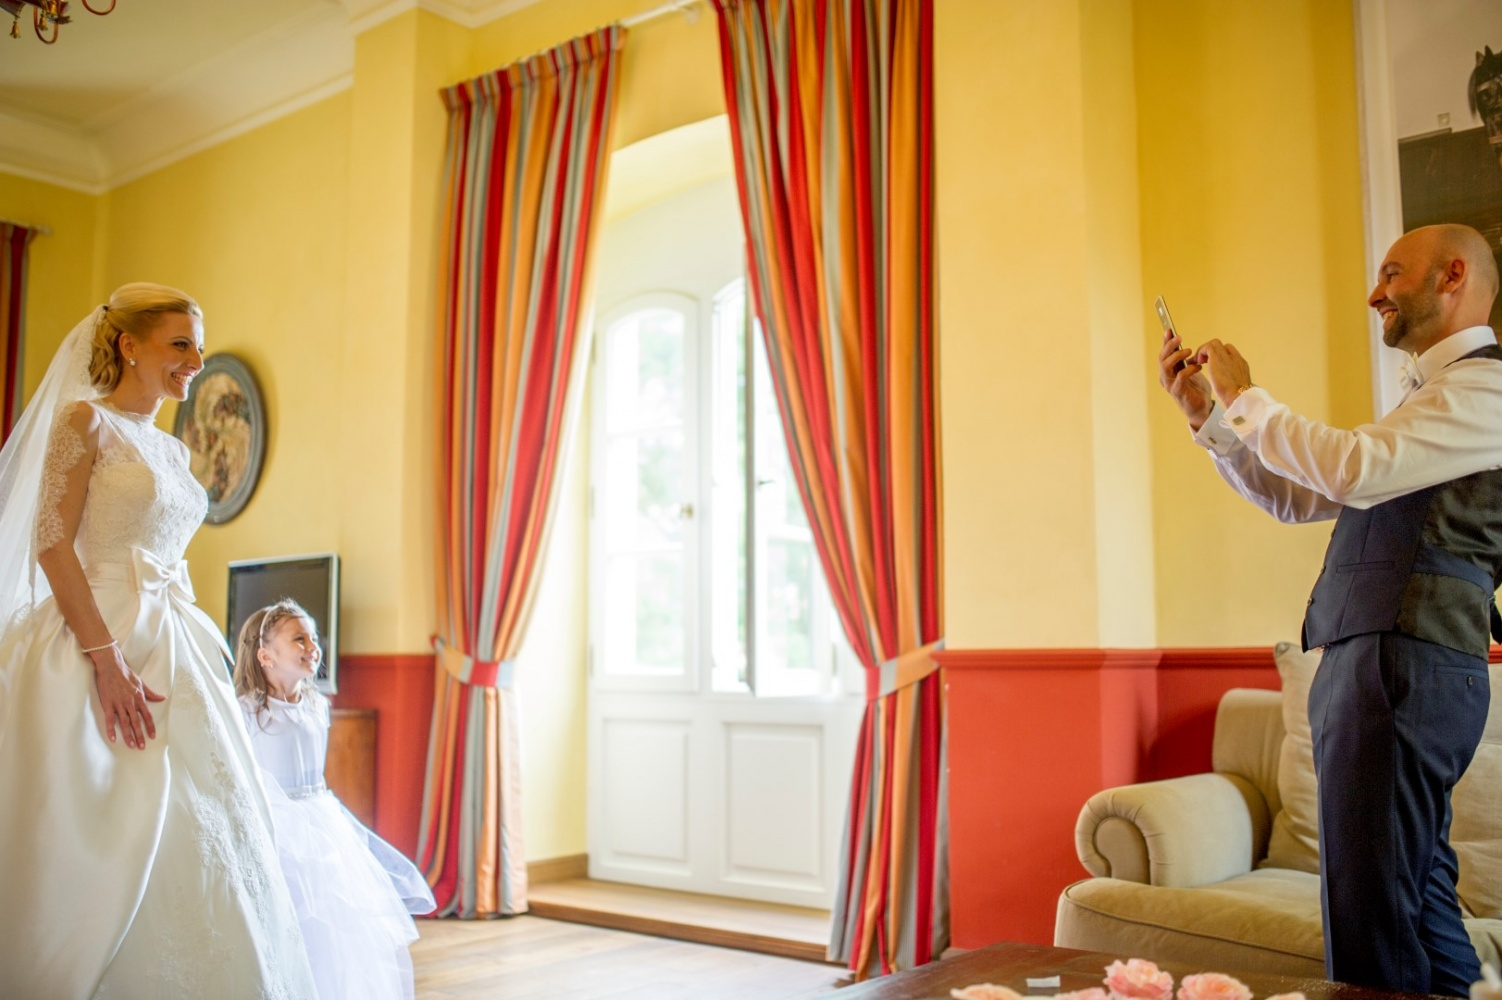 http://www.fotoz.sk/images/gallery-26/normal/svadba_hotel-chateau-bela_043.jpg